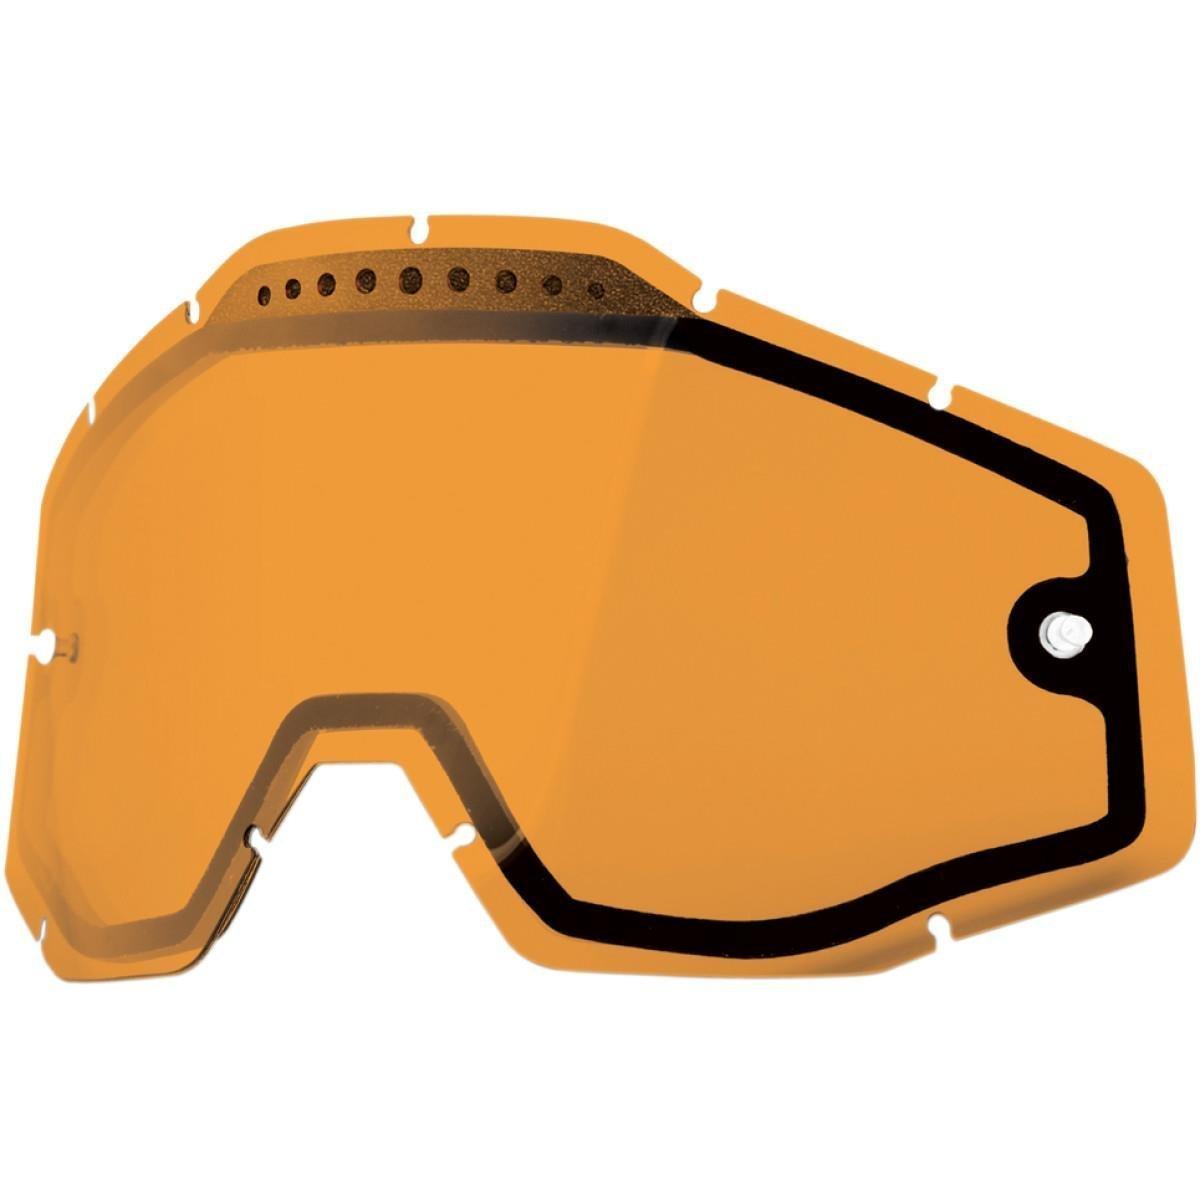 100% Dual Vented Lens for Racecraft/Accuri Goggles - Persimmon